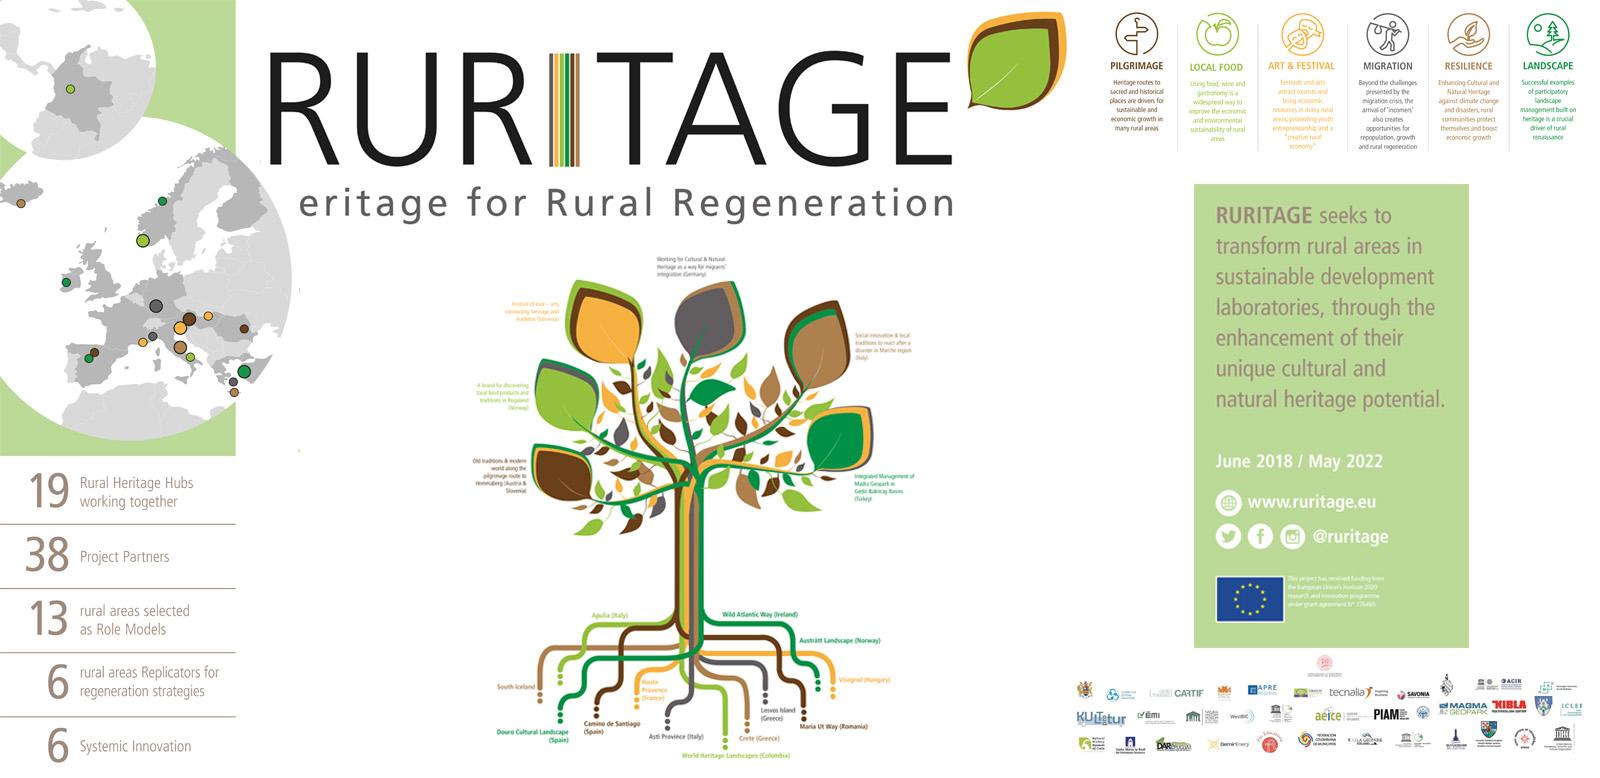 ruritage2-1